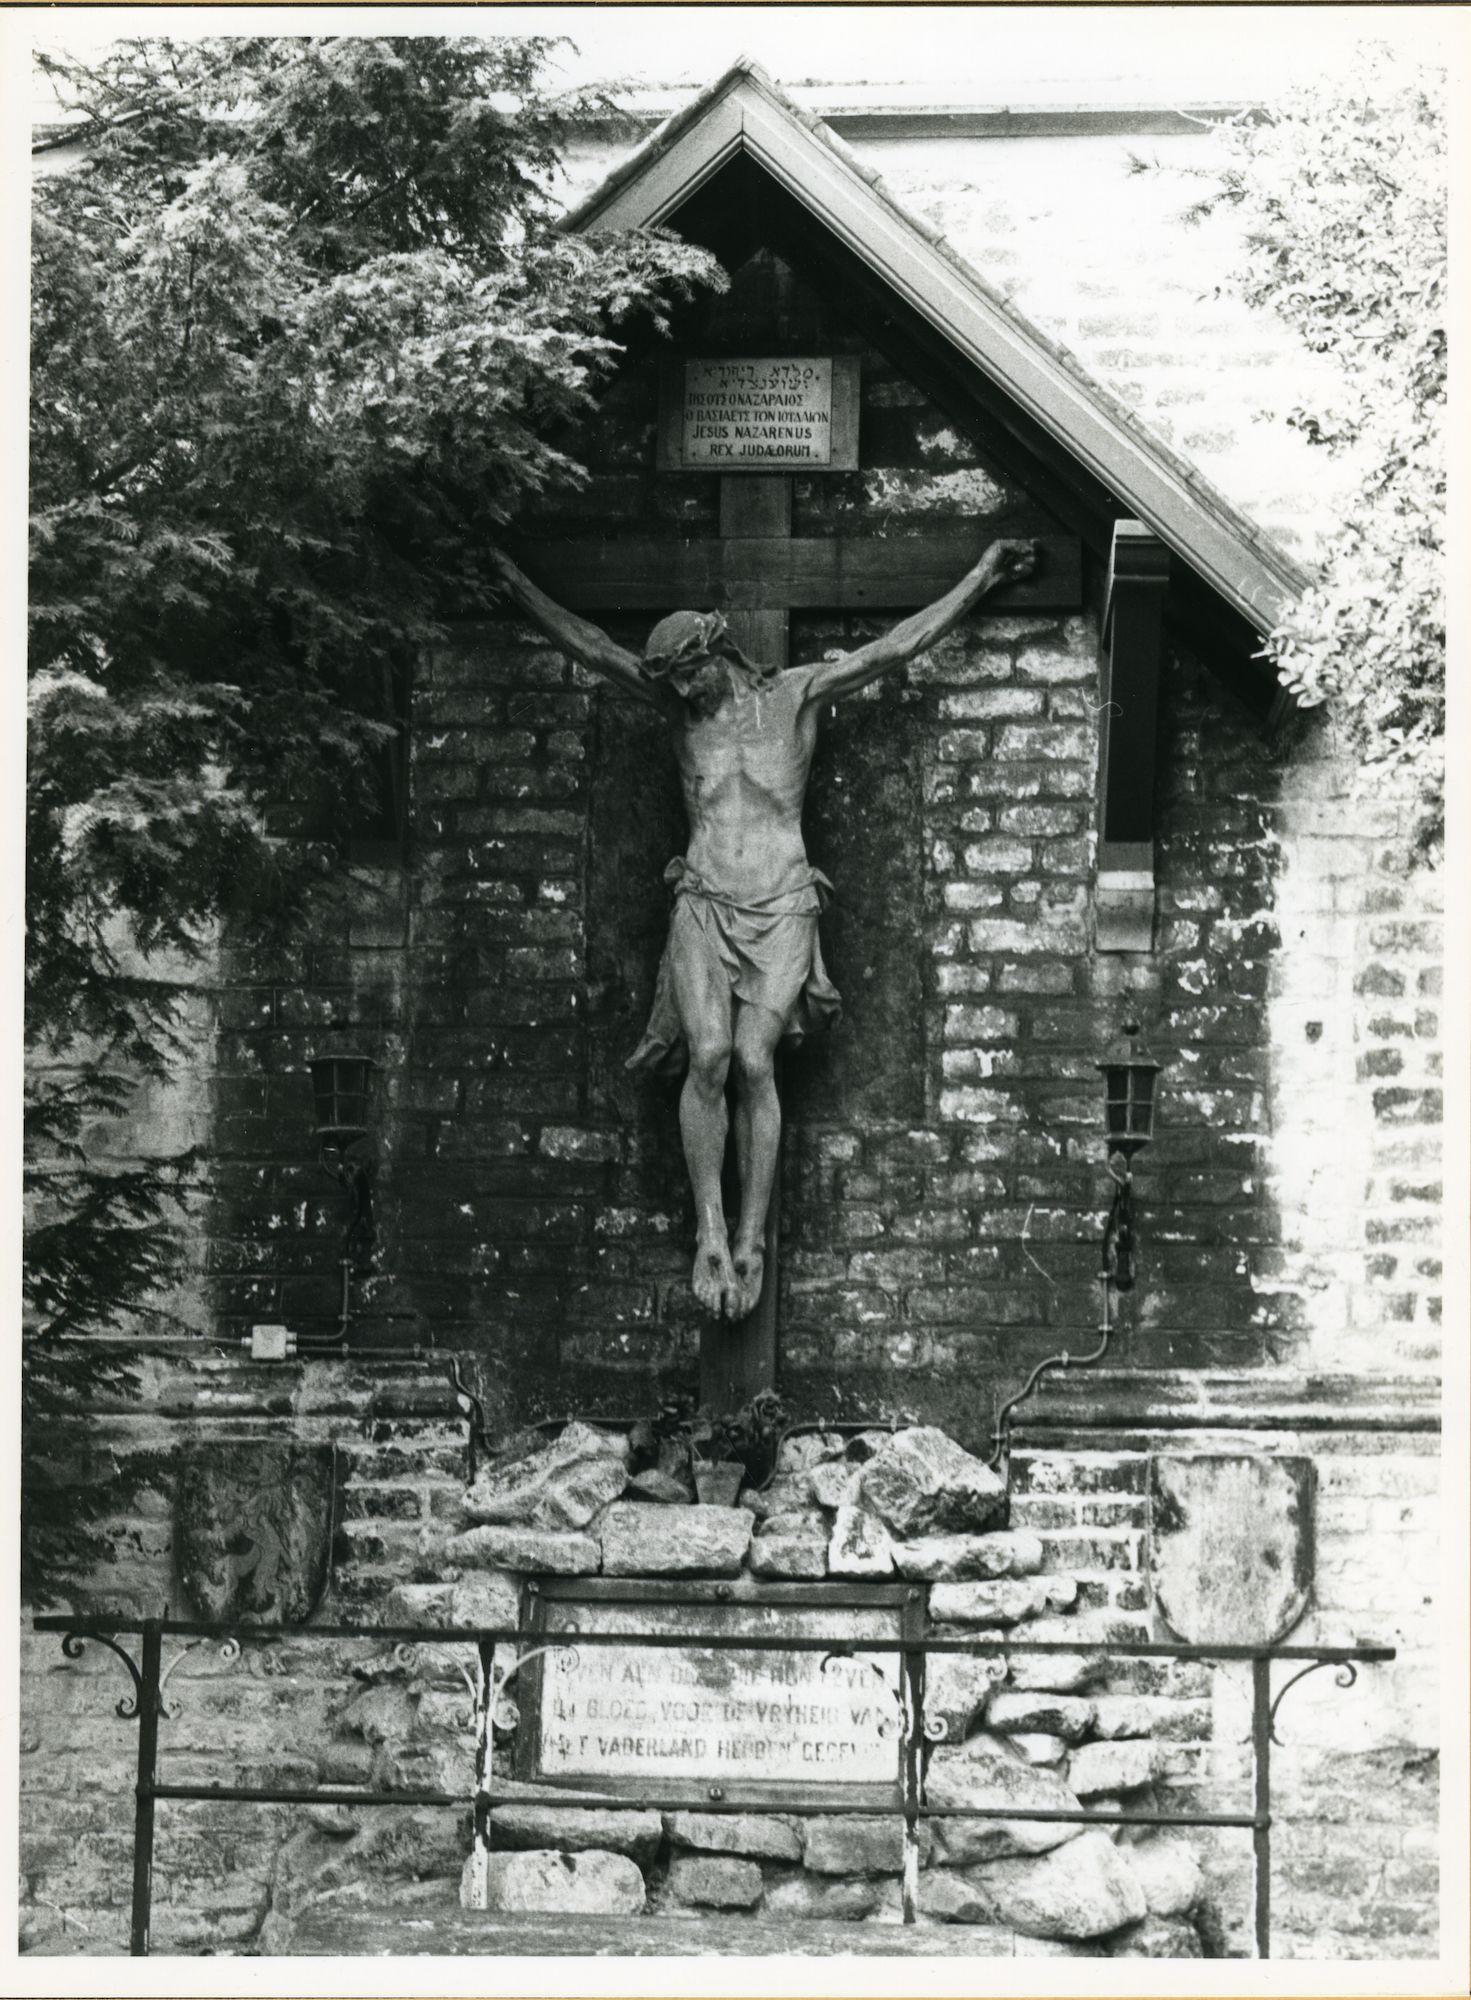 Gent: Sint Michielskerk: Beeld, 1979